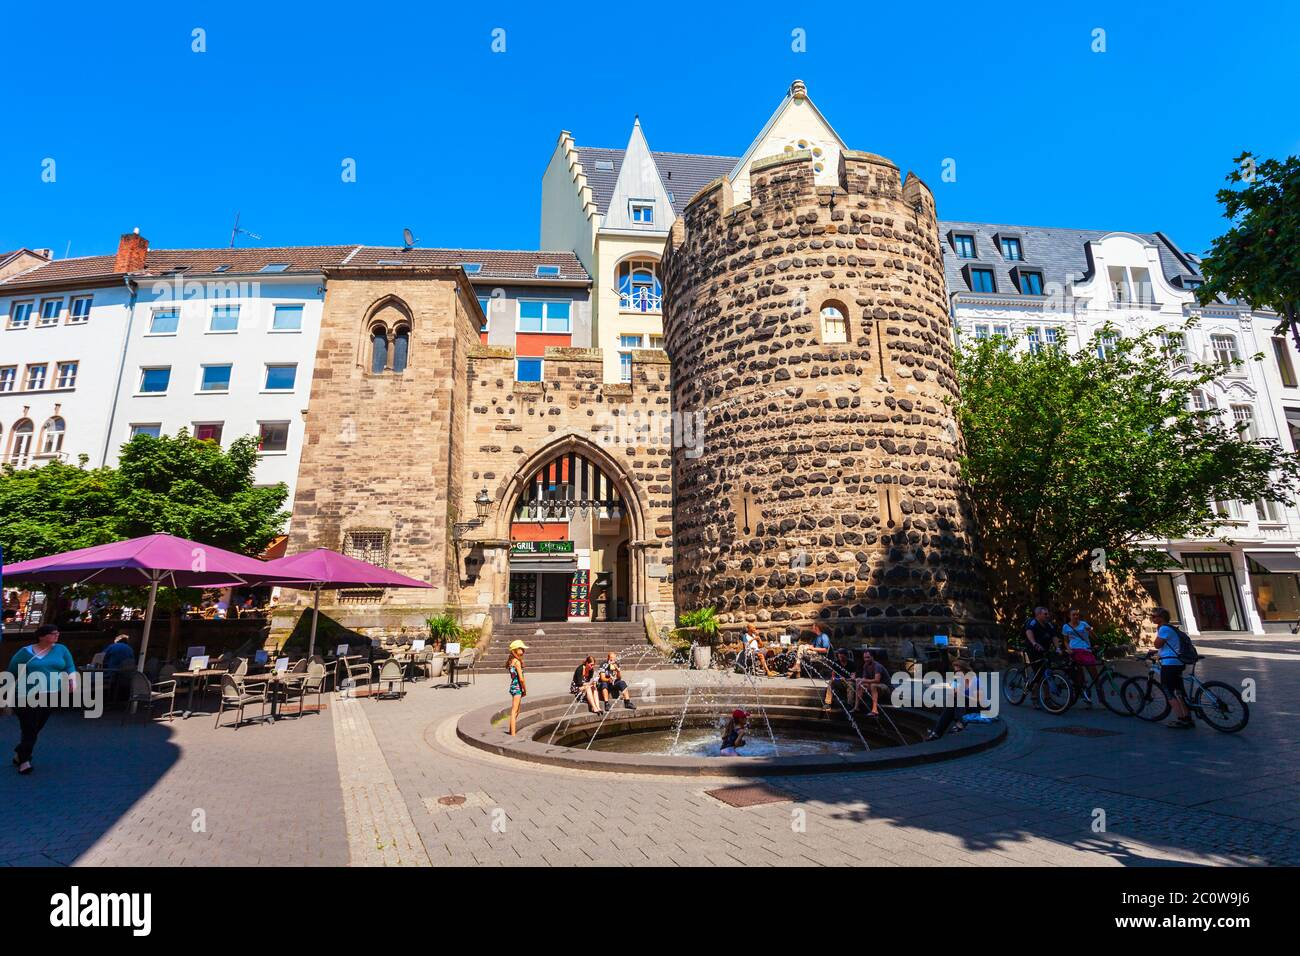 BONN, GERMANY - JUNE 29, 2018: Sterntor or star gate tower in Bonn city, Germany Stock Photo